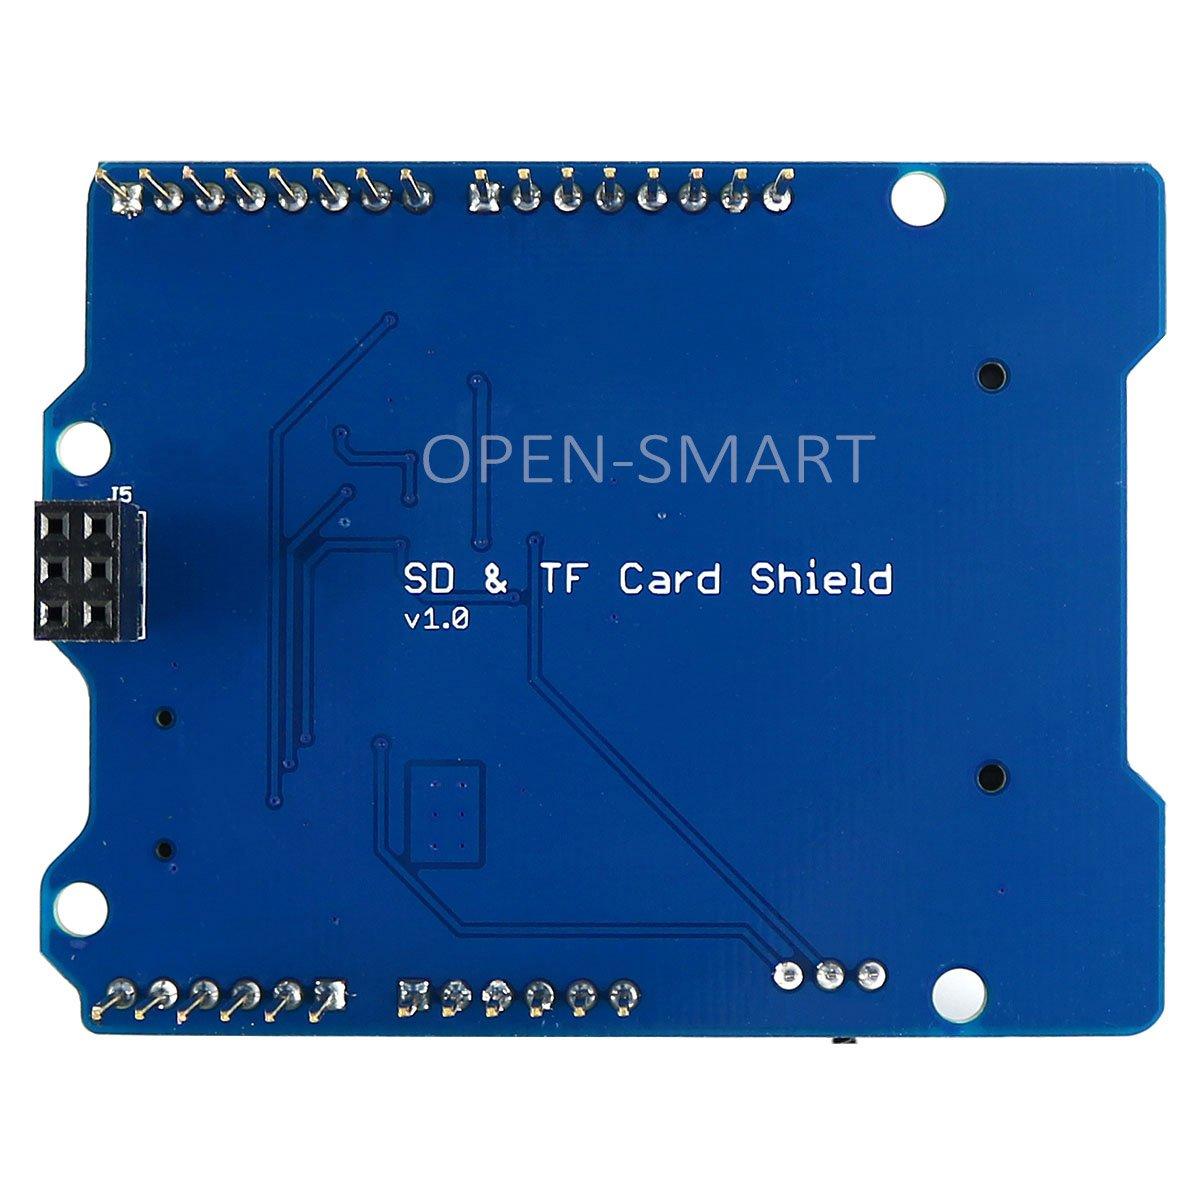 HiLetgo Stackable SD Card and TF Card Shield for Arduino UNO